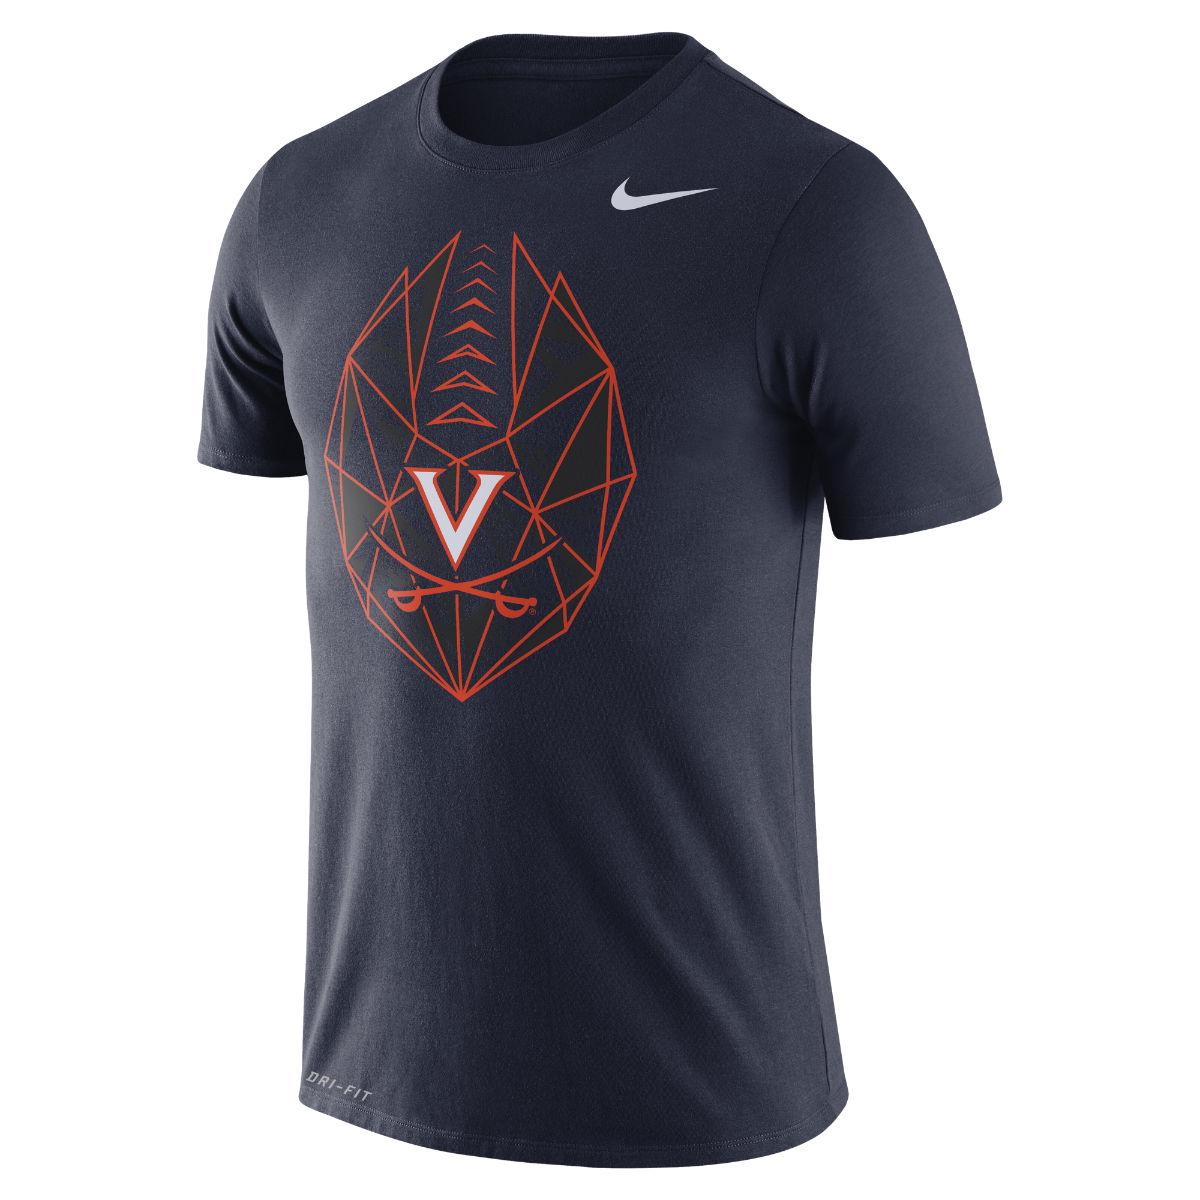 University of Virginia Football Icon NIKE T-shirt